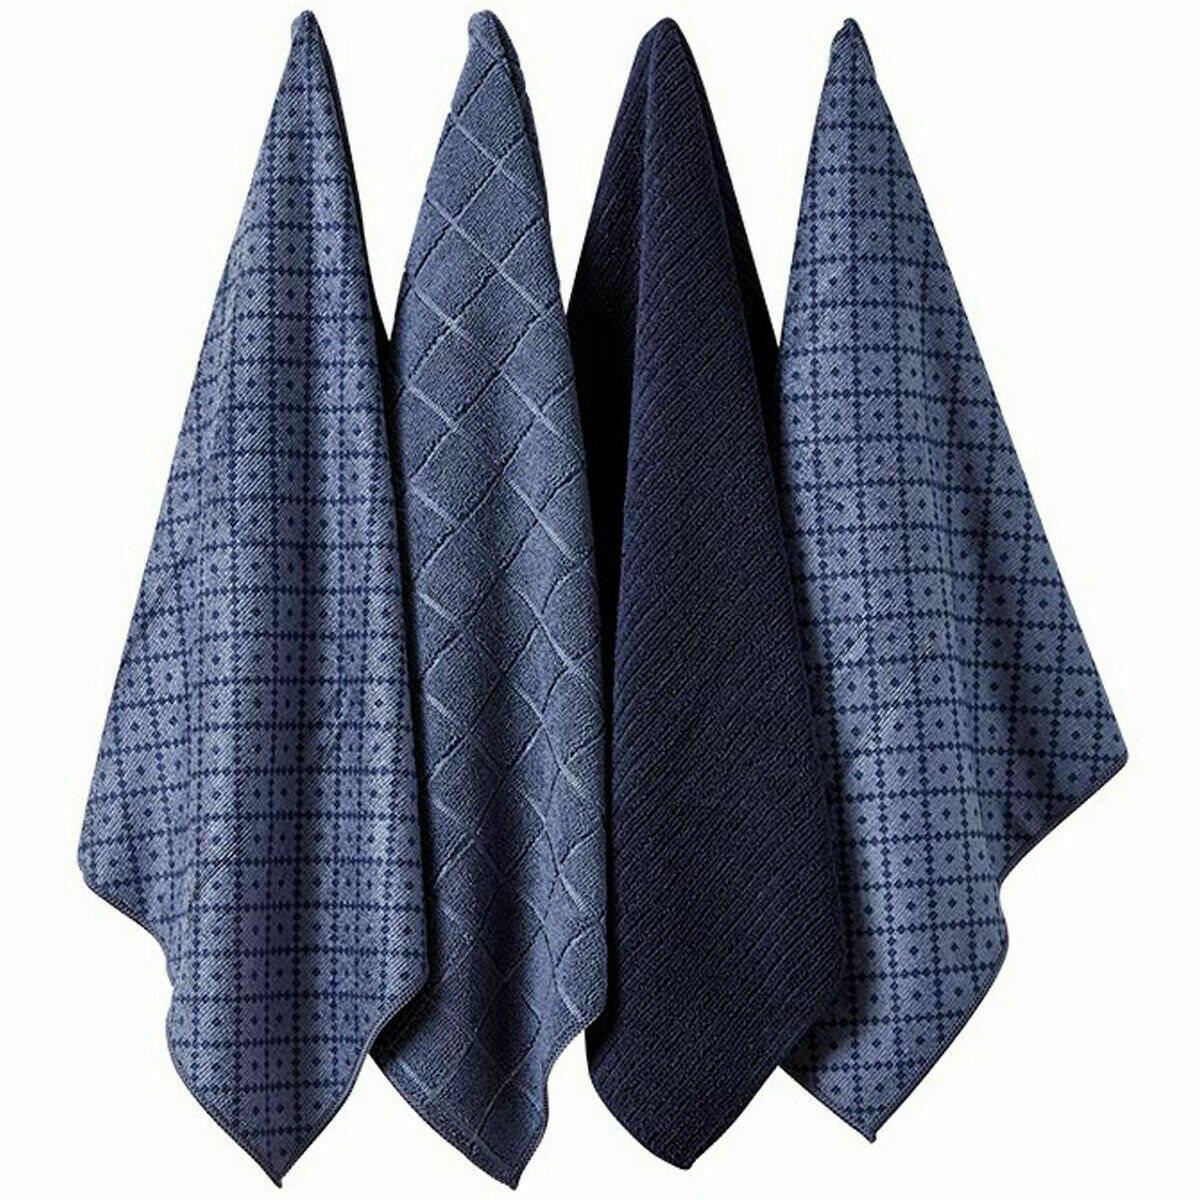 Ladelle Πετσέτες Κουζίνας Microfibre Μπλε Carver 43X68cm - Σετ 4 Τεμαχίων